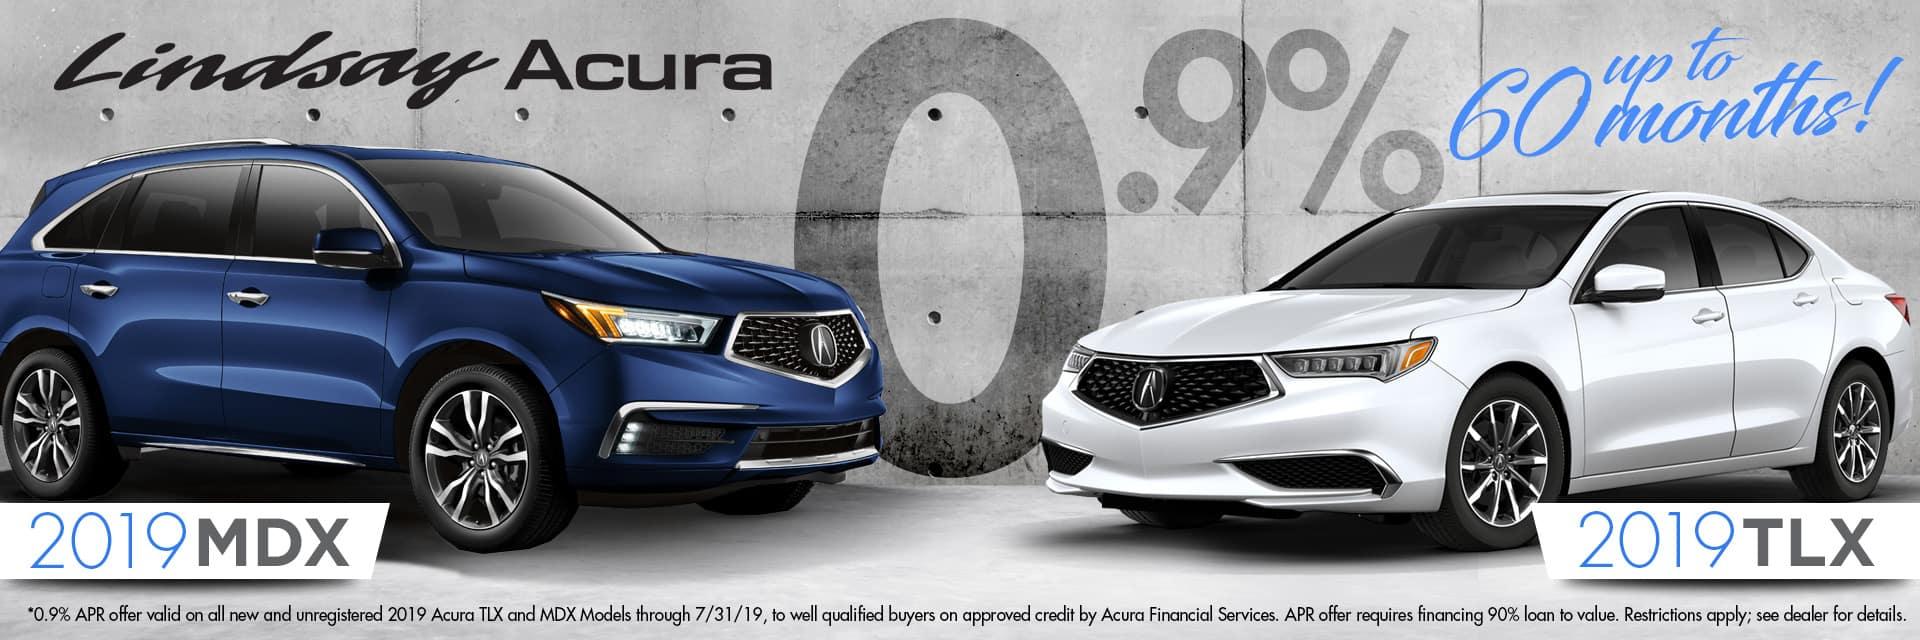 Lindsay Acura Acura Dealer In Columbus Oh